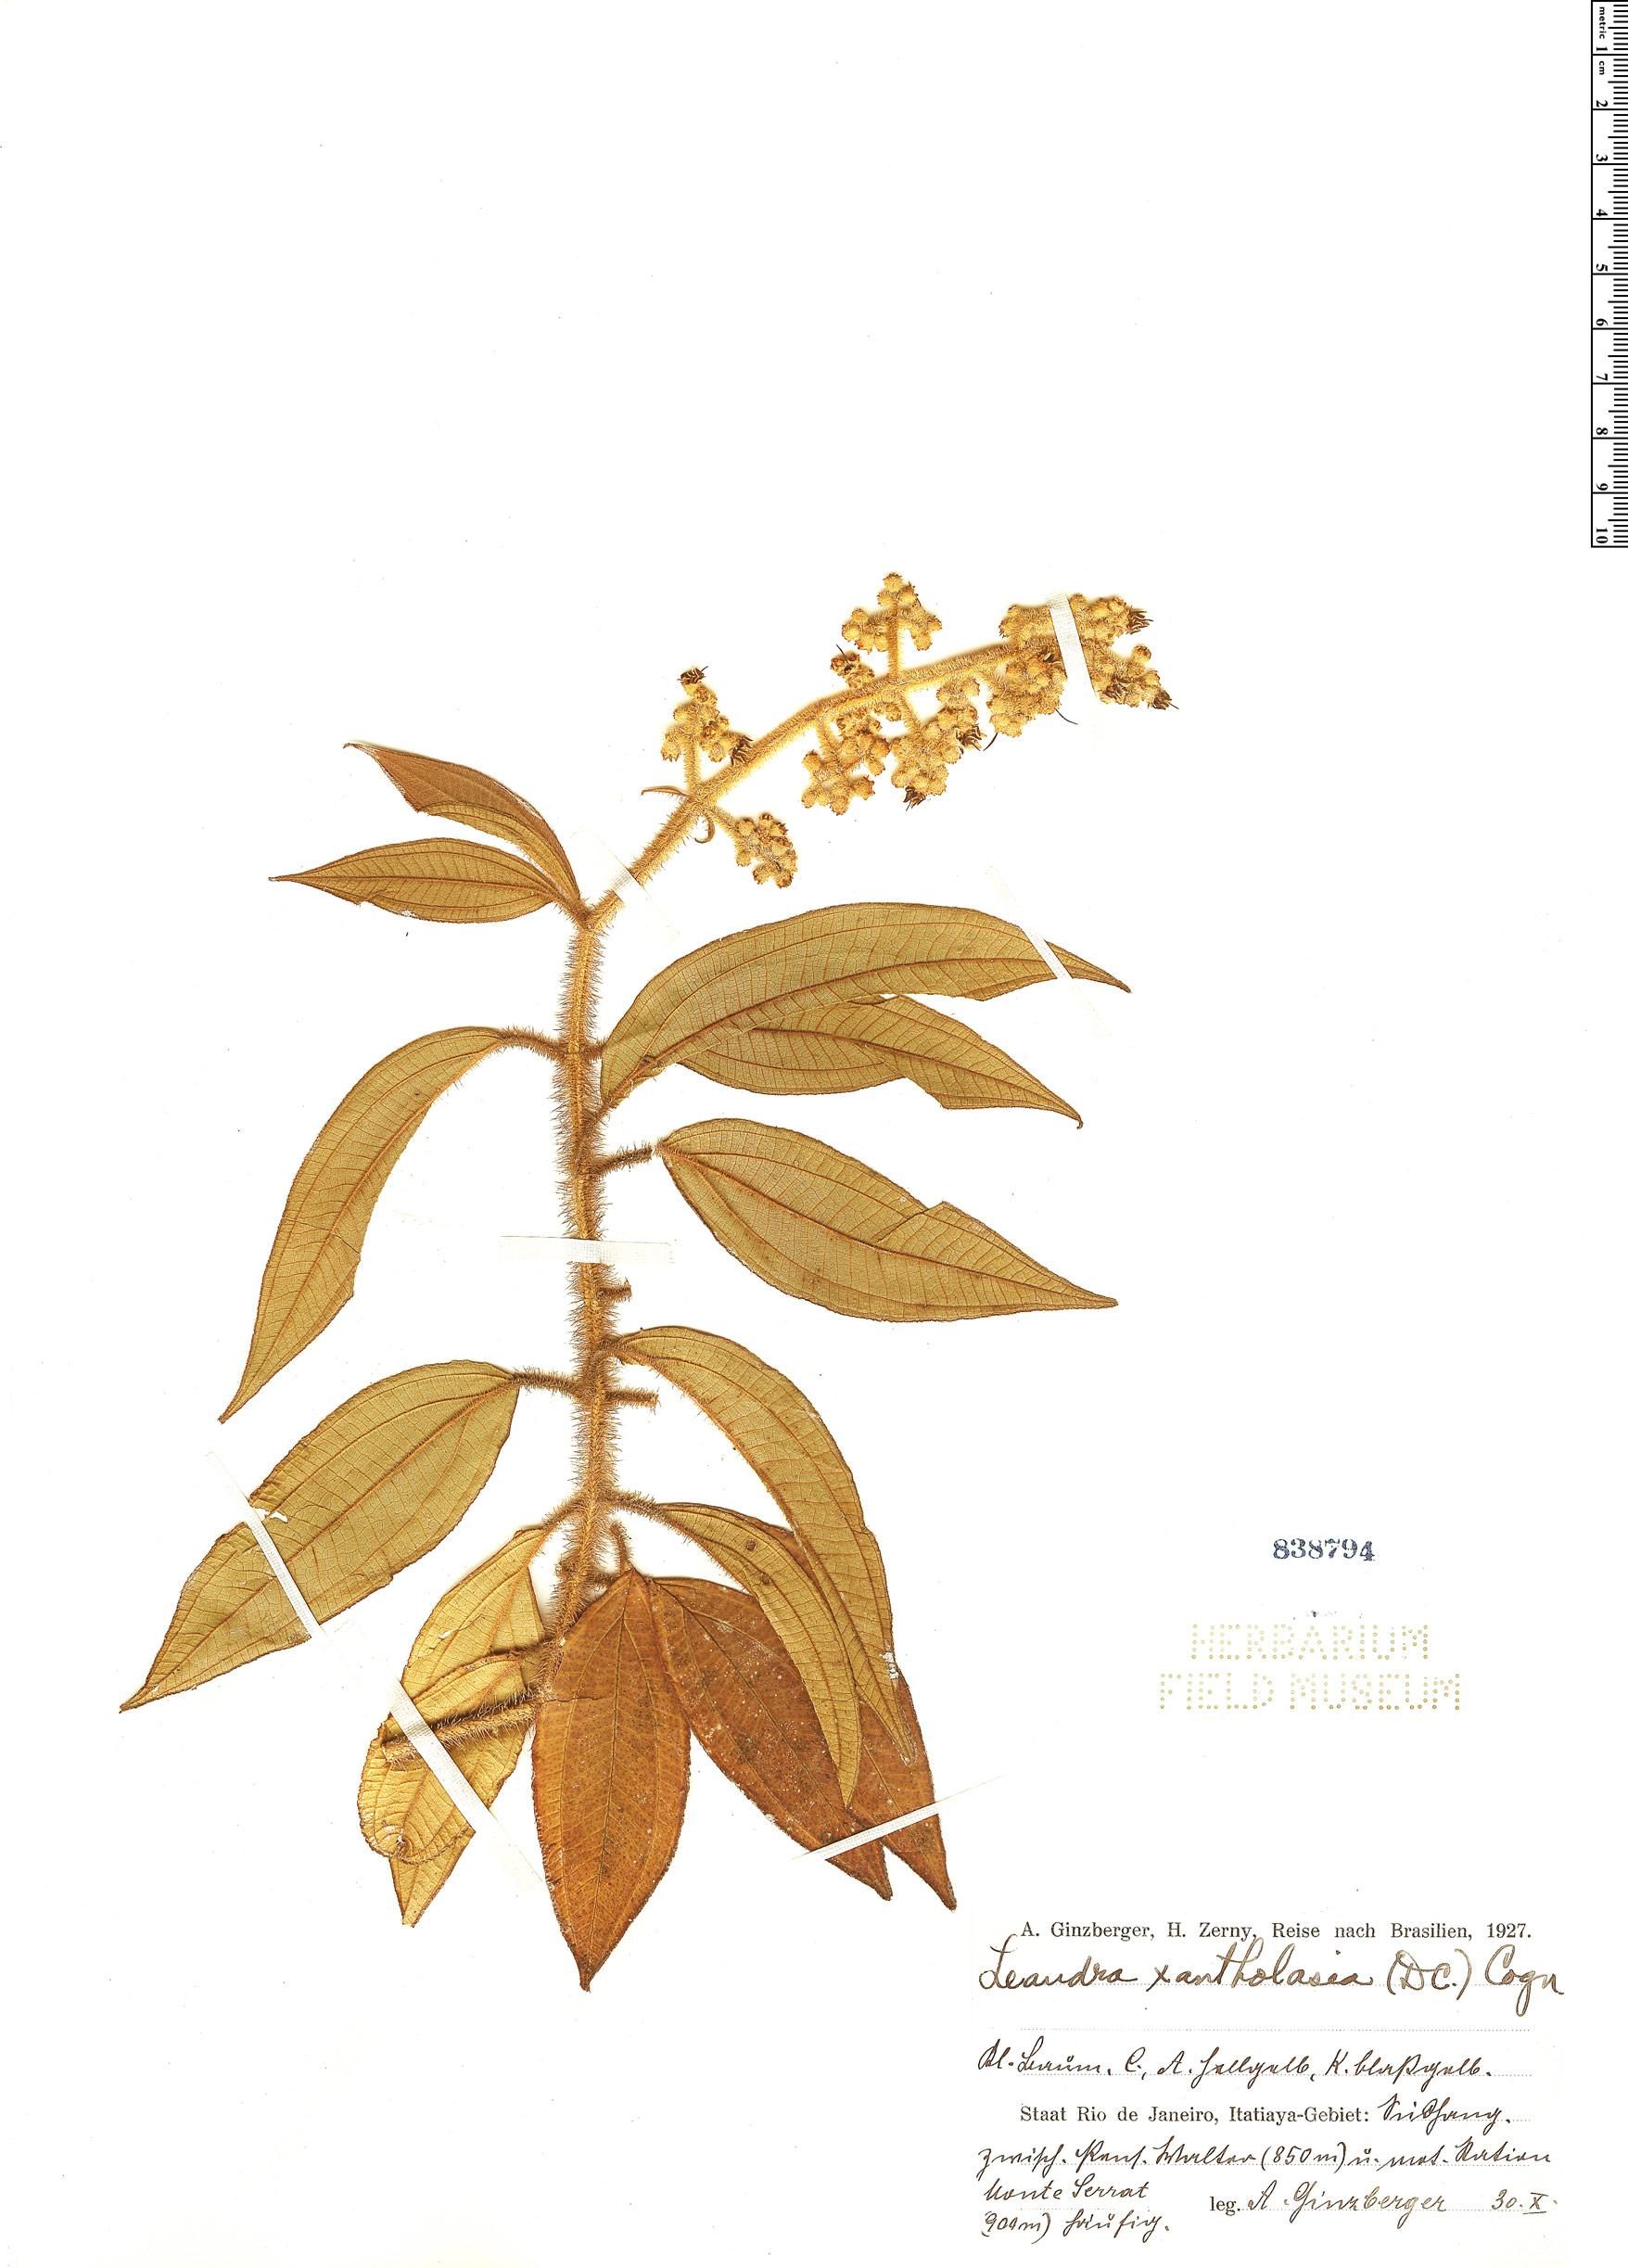 Specimen: Leandra xantholasia